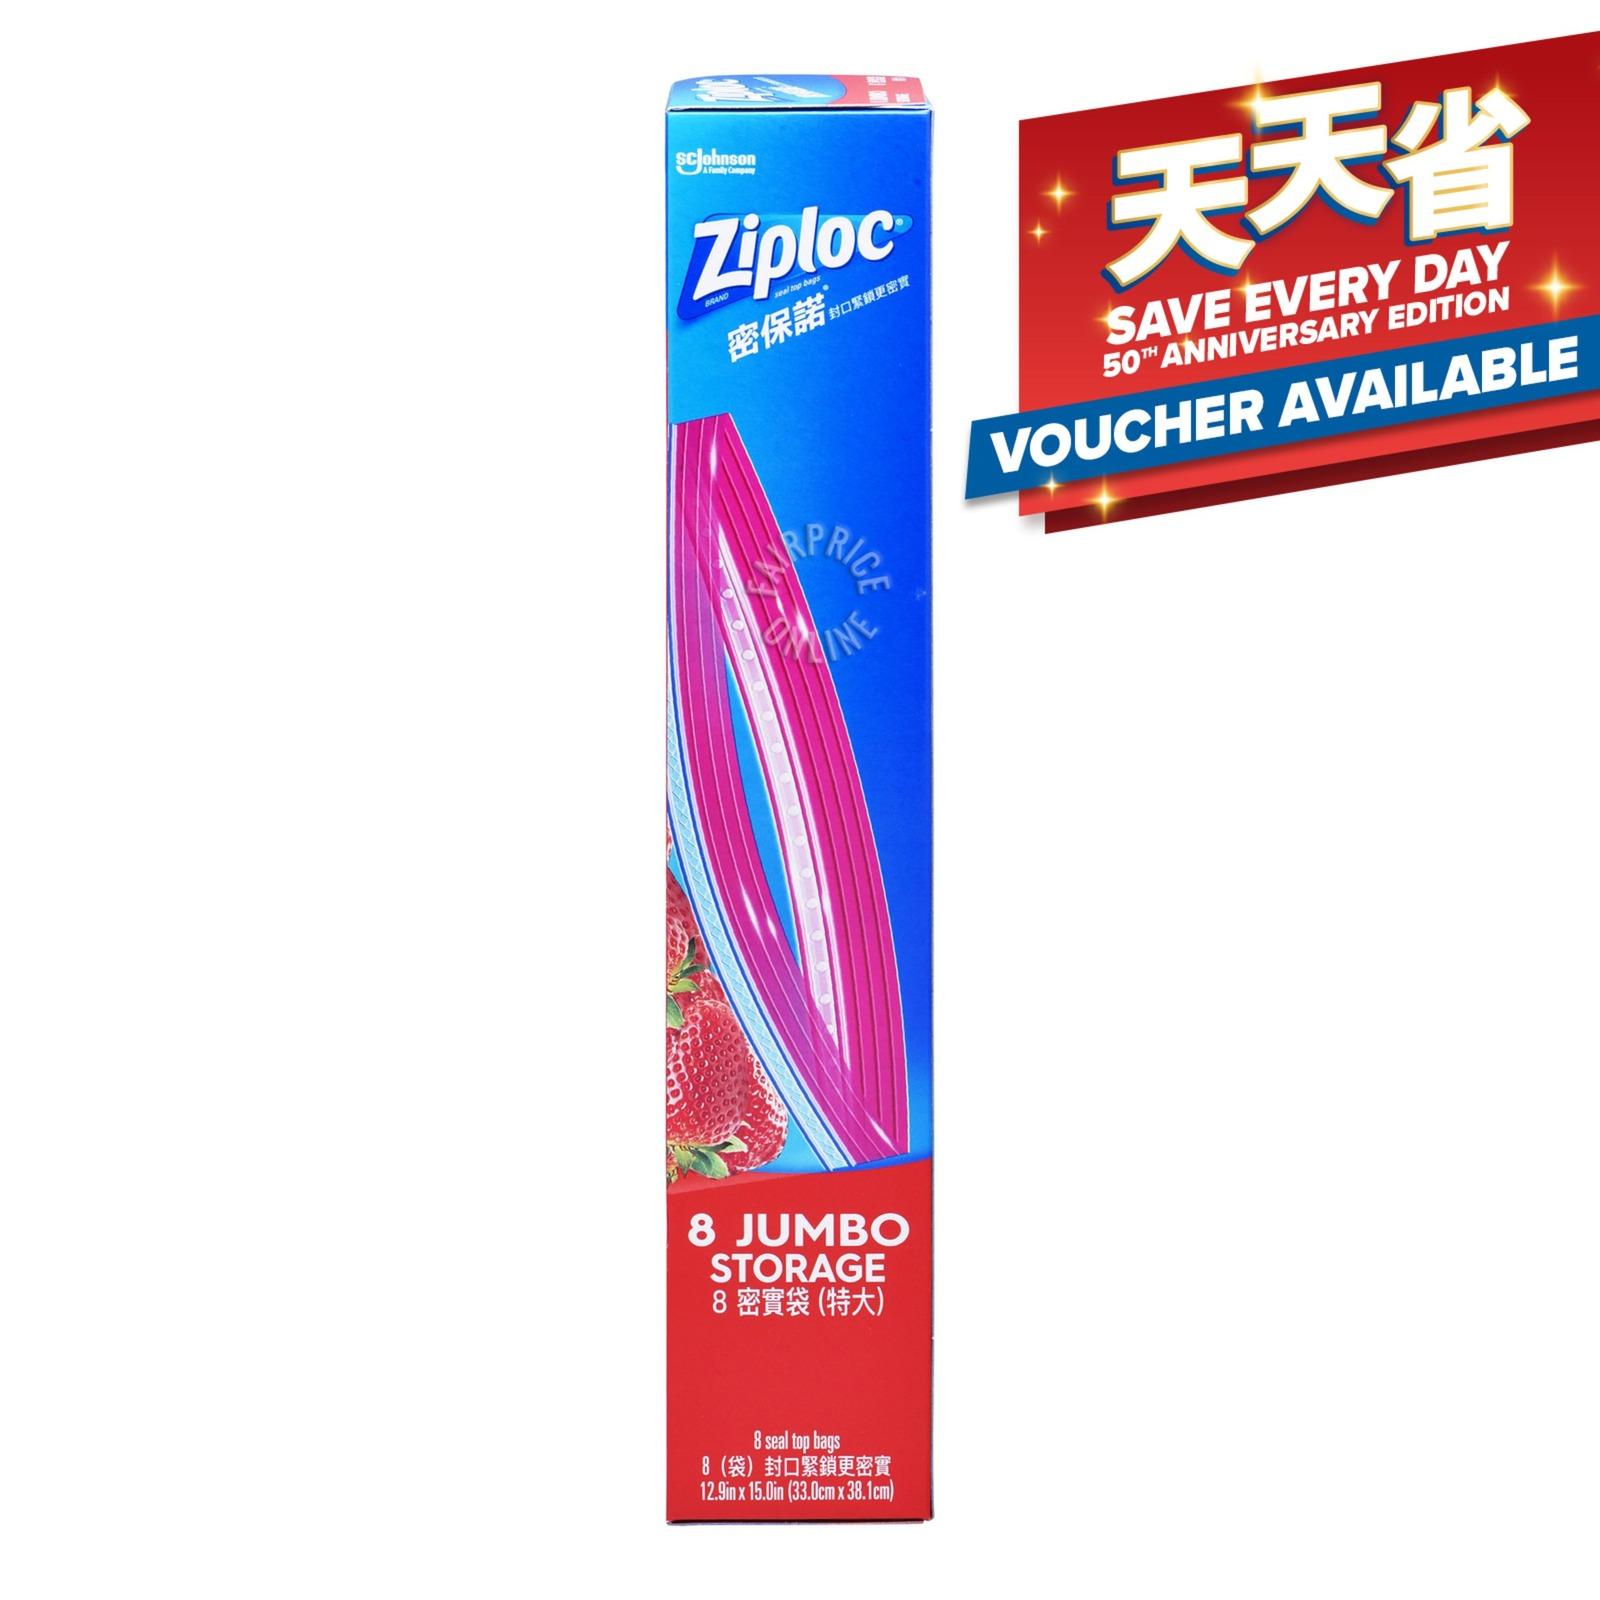 Ziploc Double Zipper Storage Bags - Jumbo